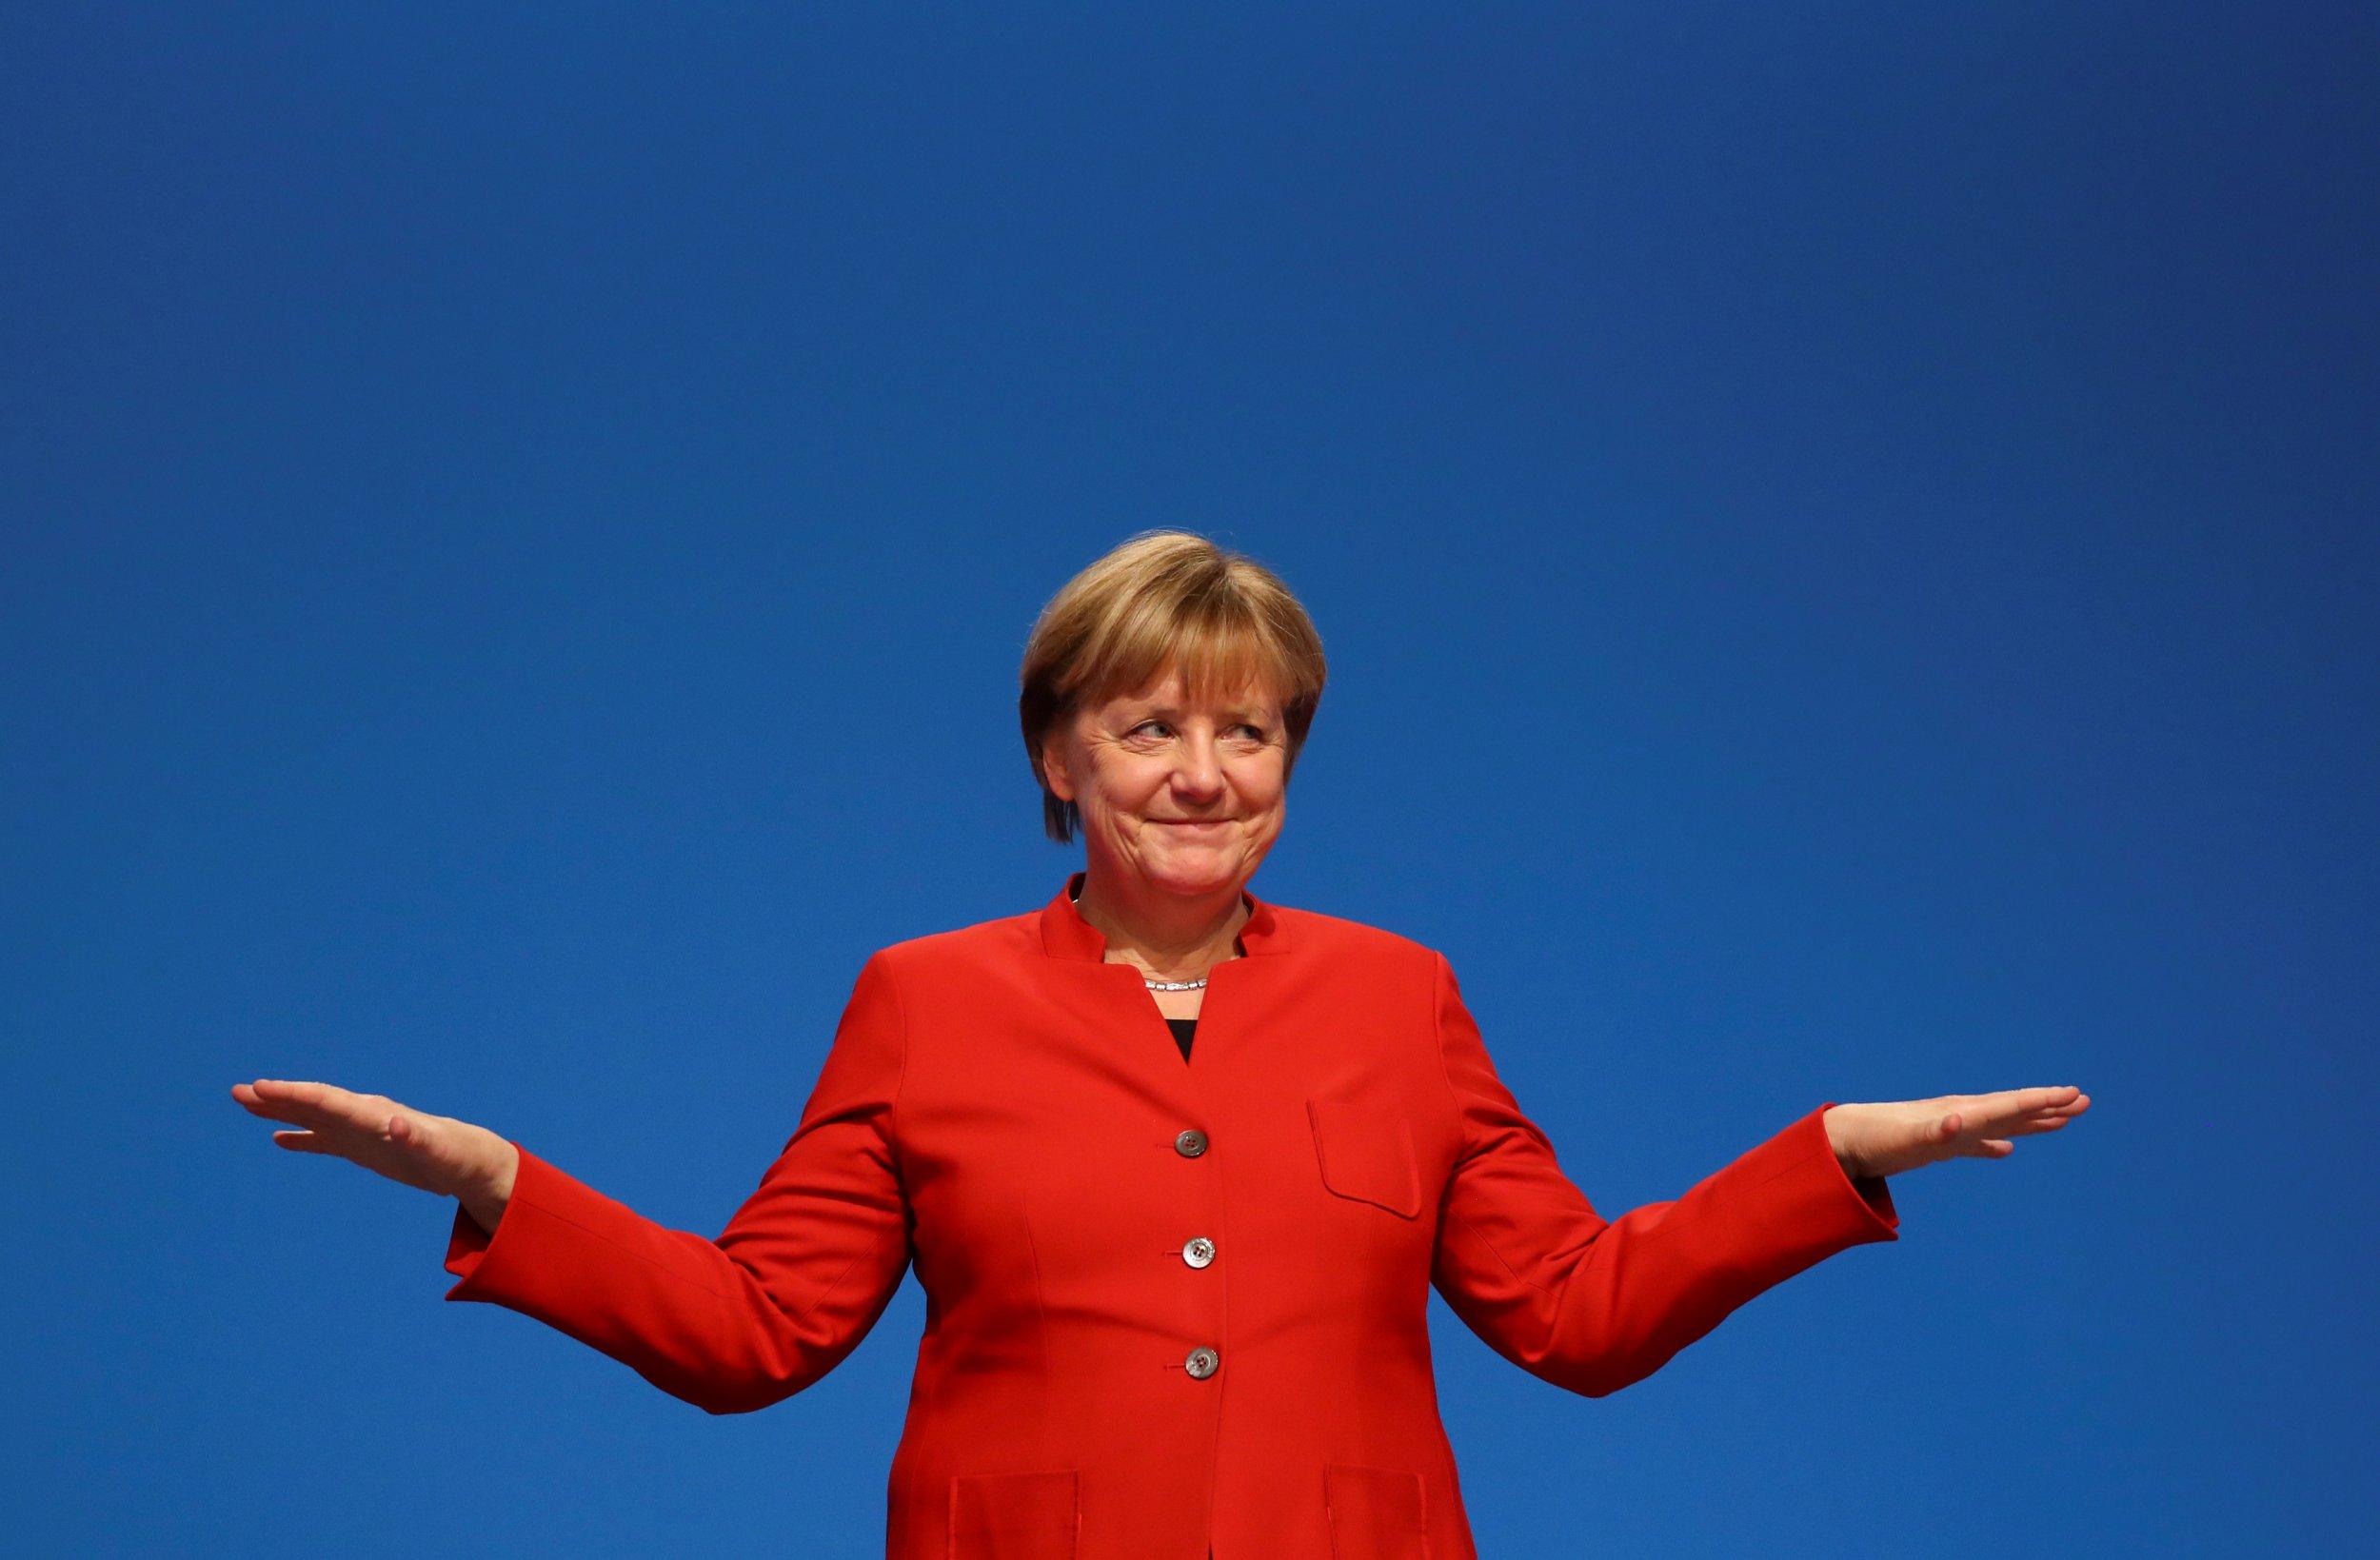 09_22_Angela_Merkel_Speech